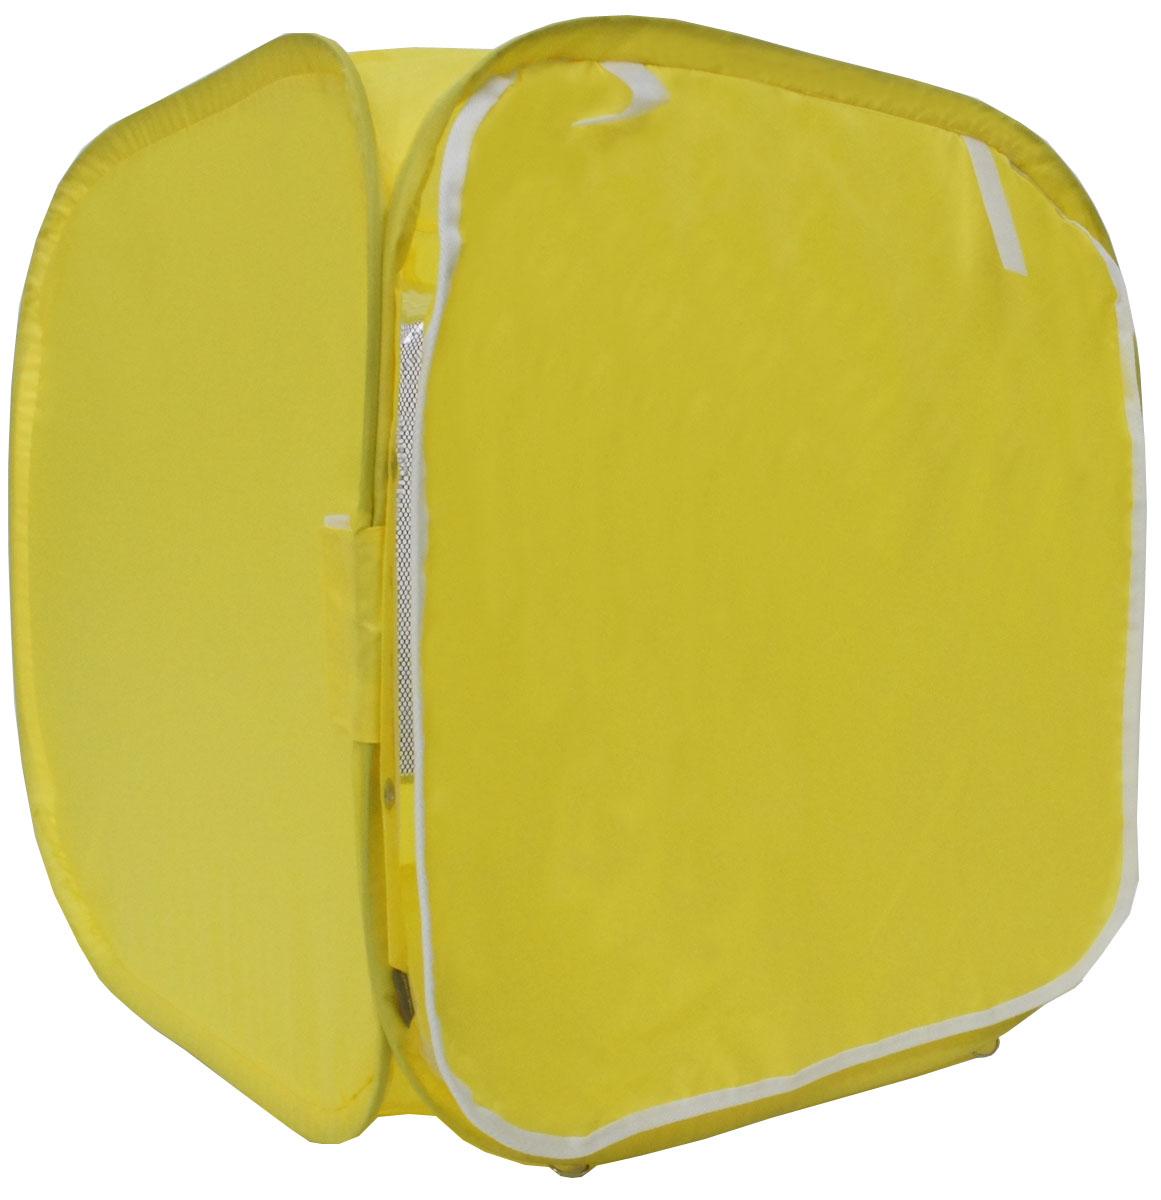 Палатка для выставки животных  Шоу-Петс , цвет: желтый, 60 х 60 х 60 см. ПВЛ1Ж